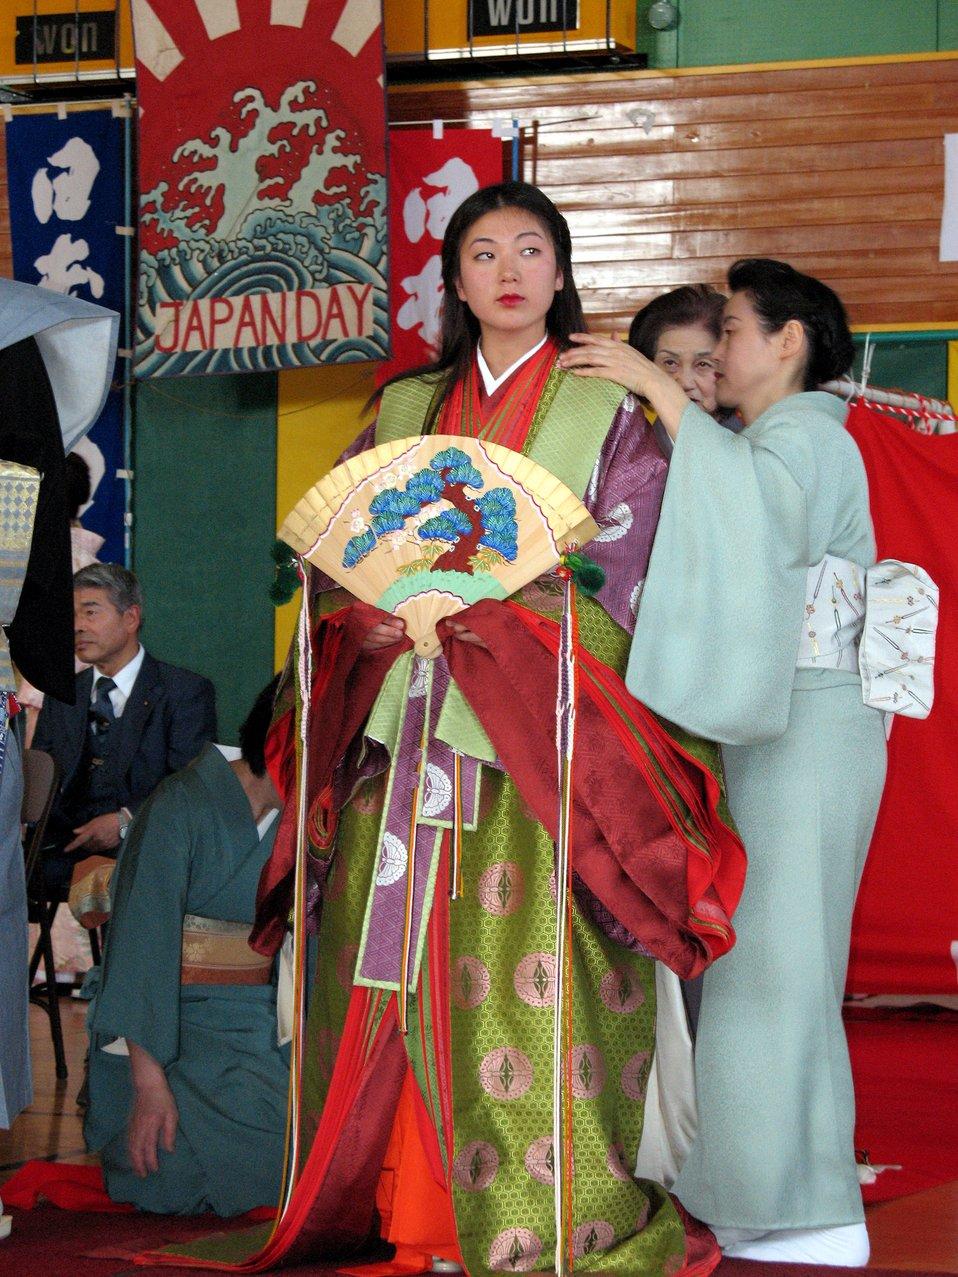 Airman celebrates base's Japan Day